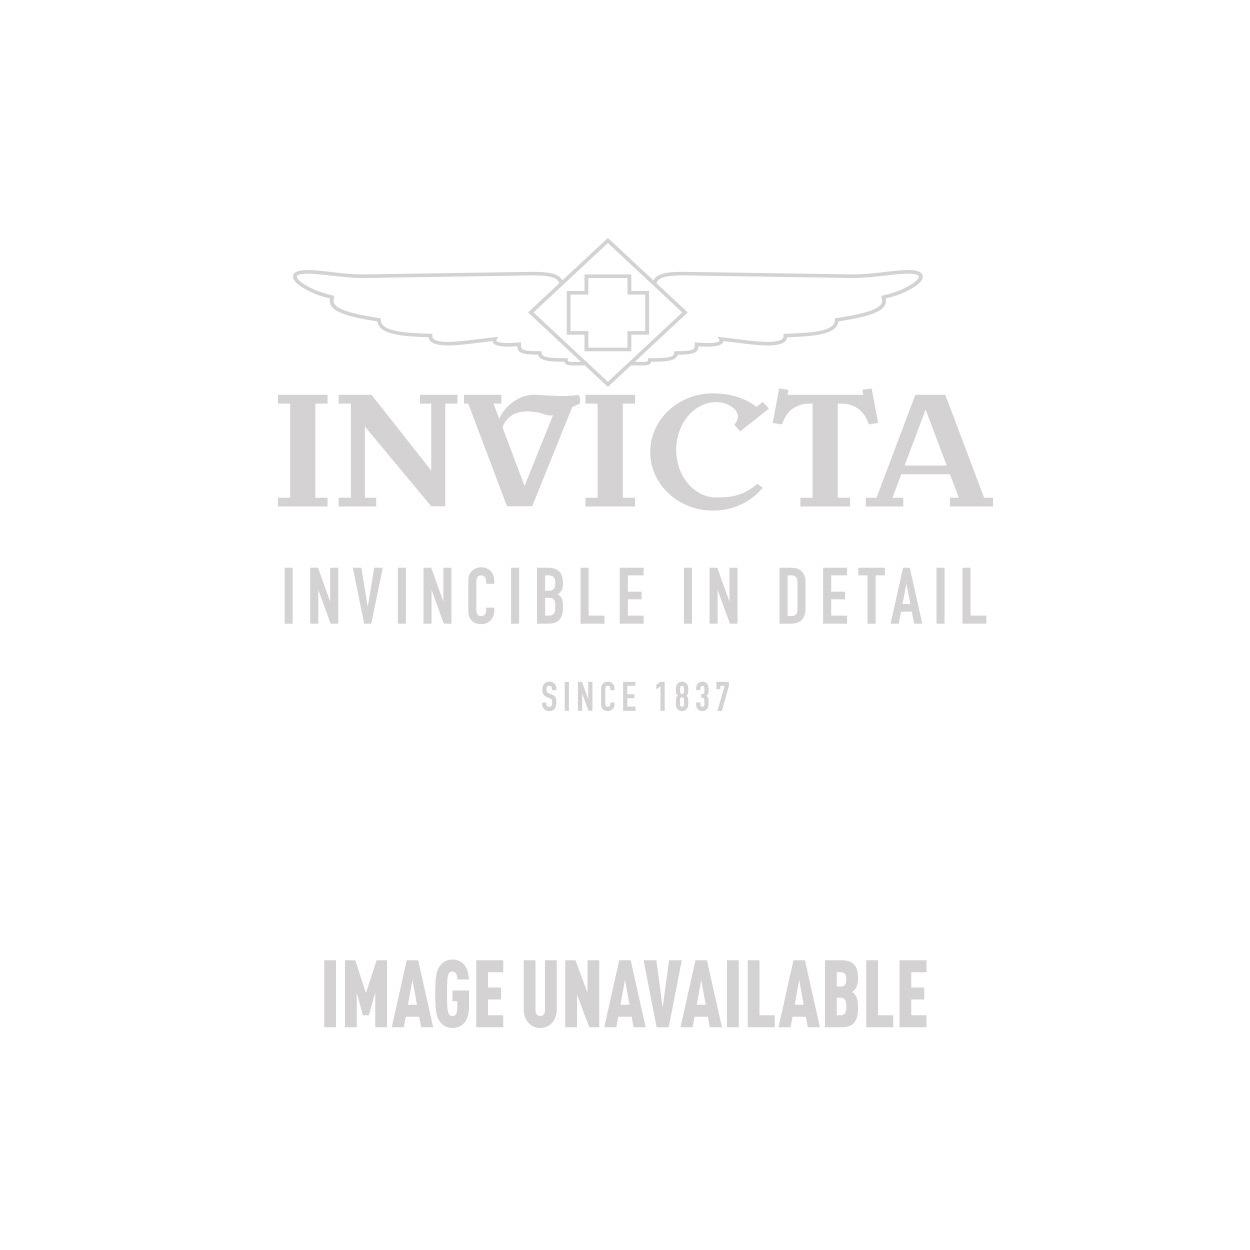 Invicta Corduba Swiss Movement Quartz Watch - Black case with Black, White tone Stainless Steel, Polyurethane band - Model 80217